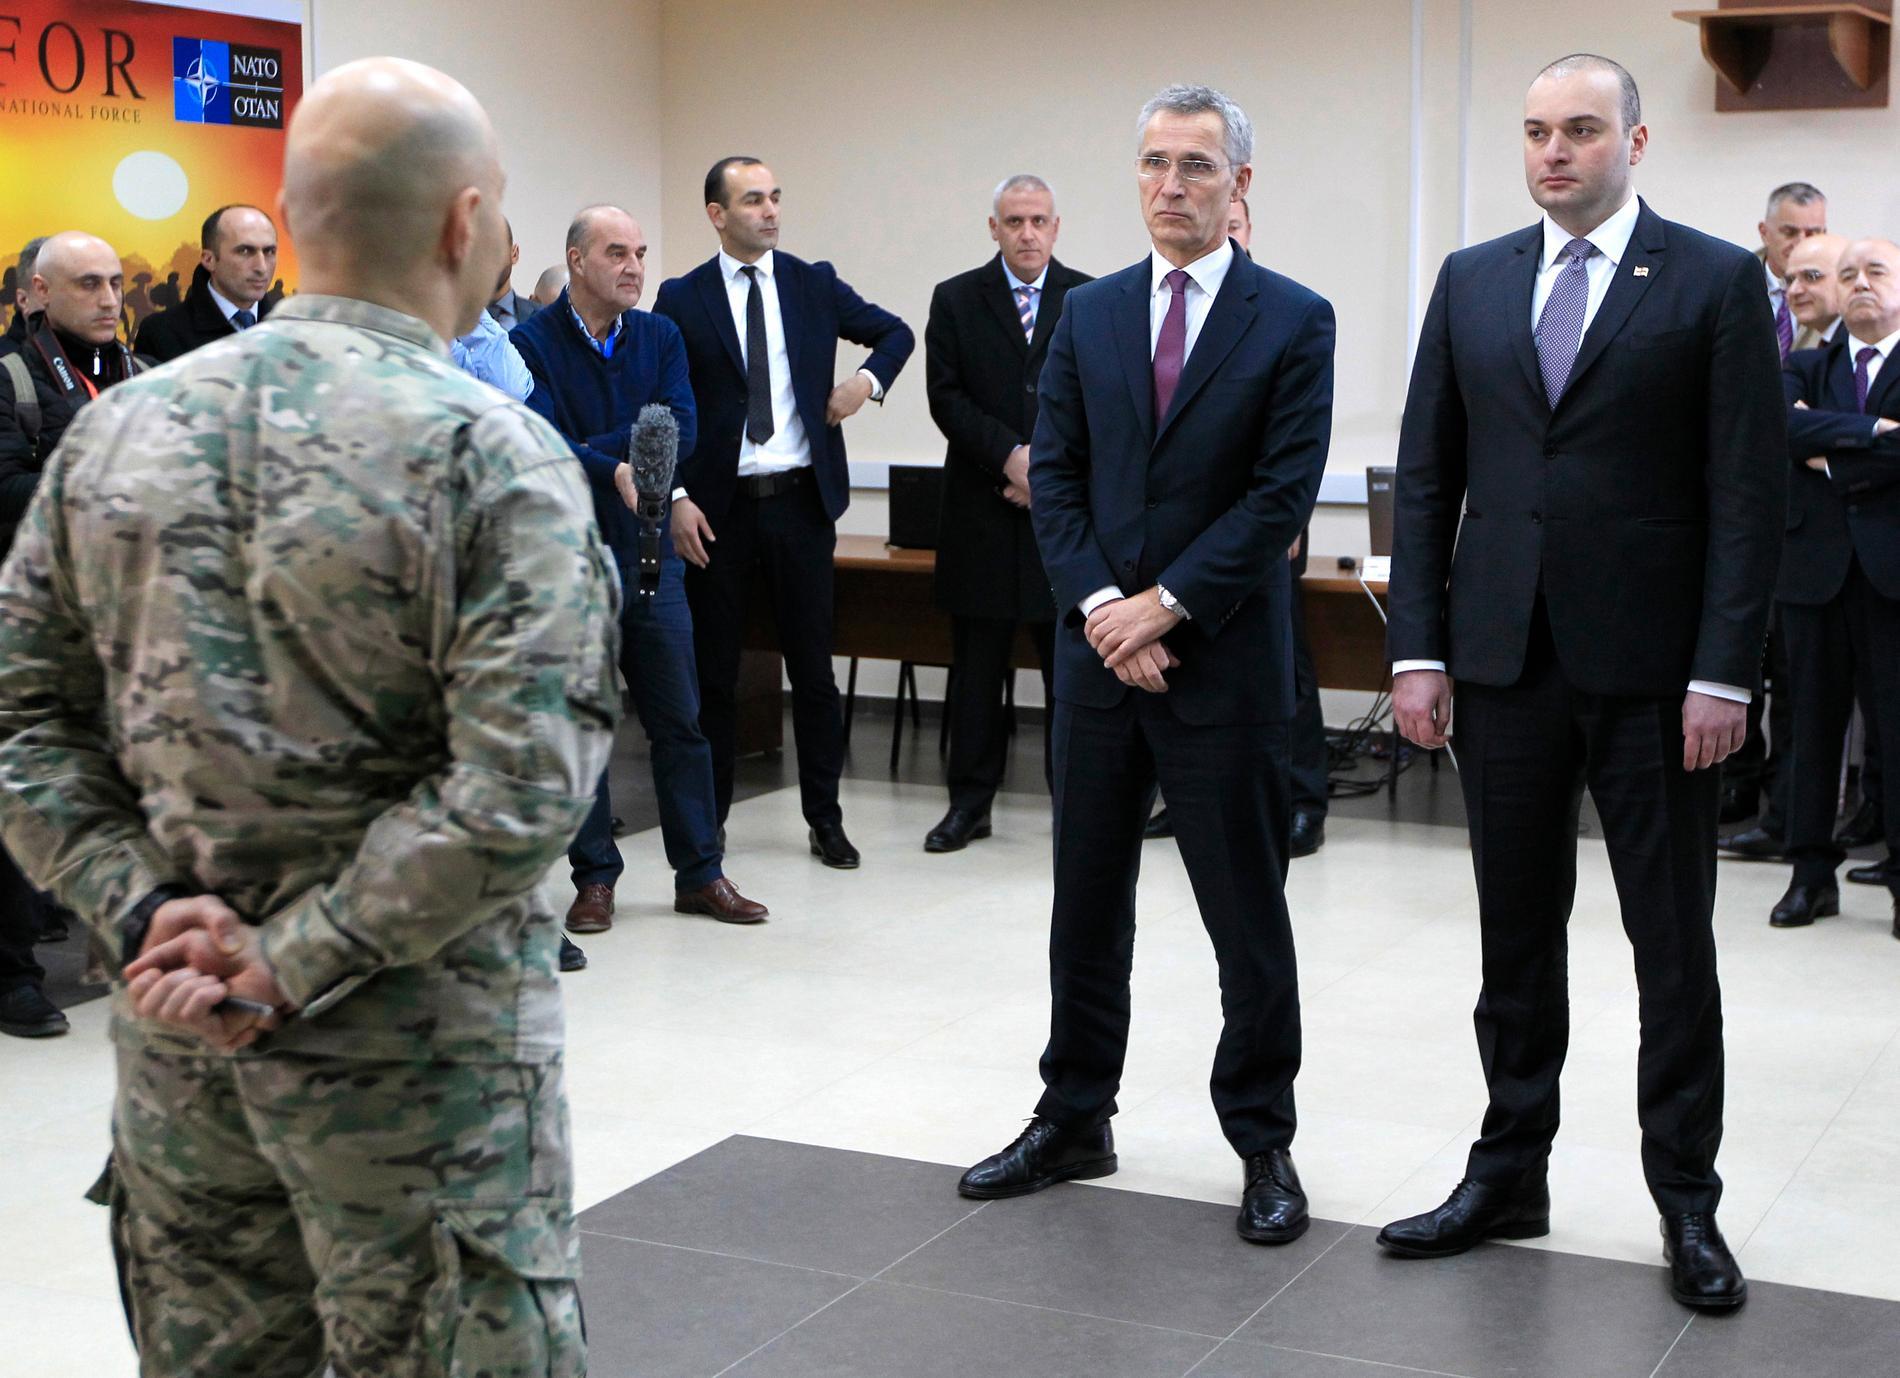 Natochefen Jens Stoltenberg sida vid sida med Georgiens premiärminister Mamuka Bakhtadze.